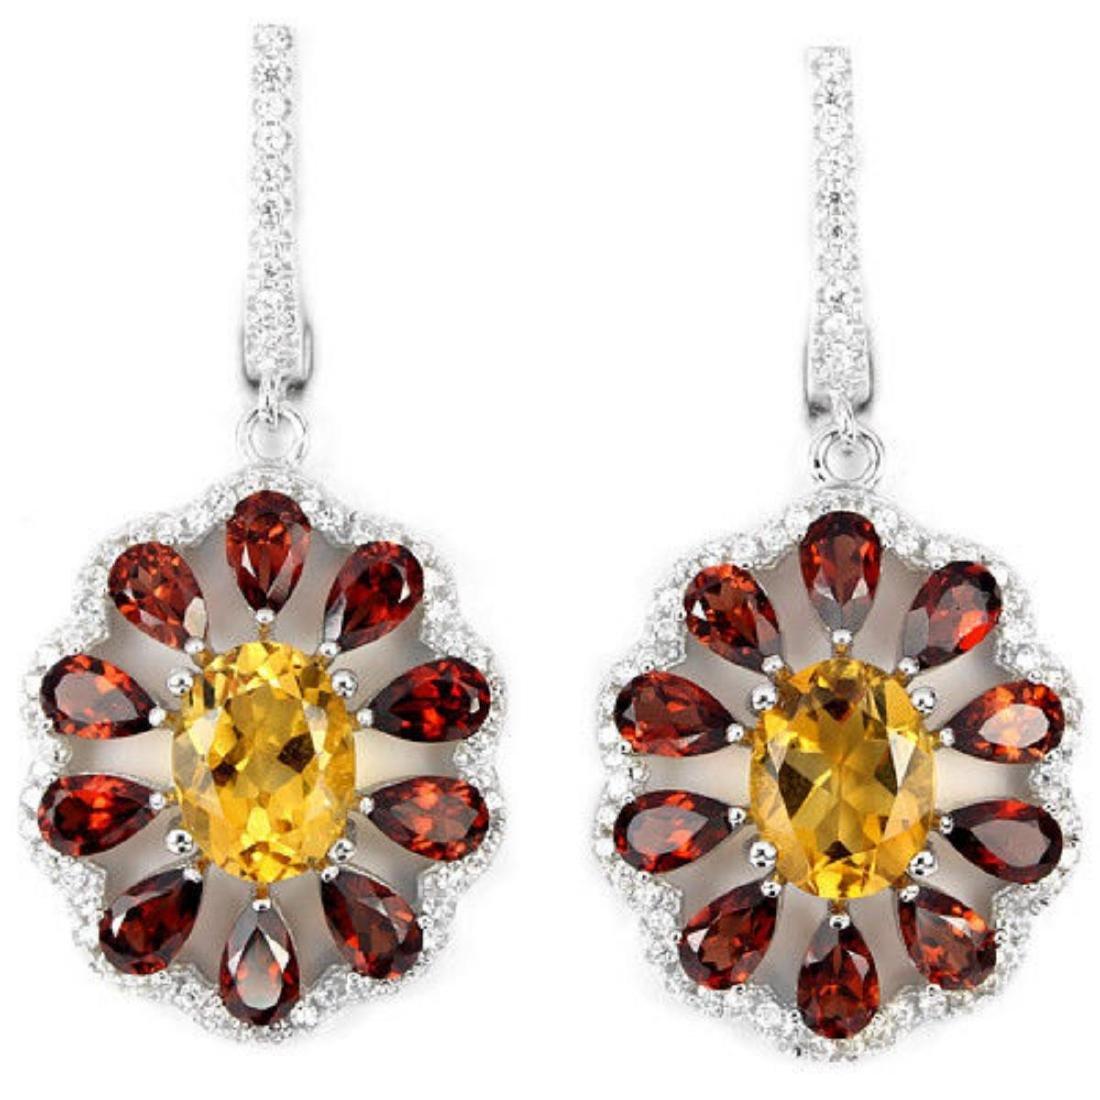 NATURAL ORANGISH YELLOW CITRINE, GARNET Earrings